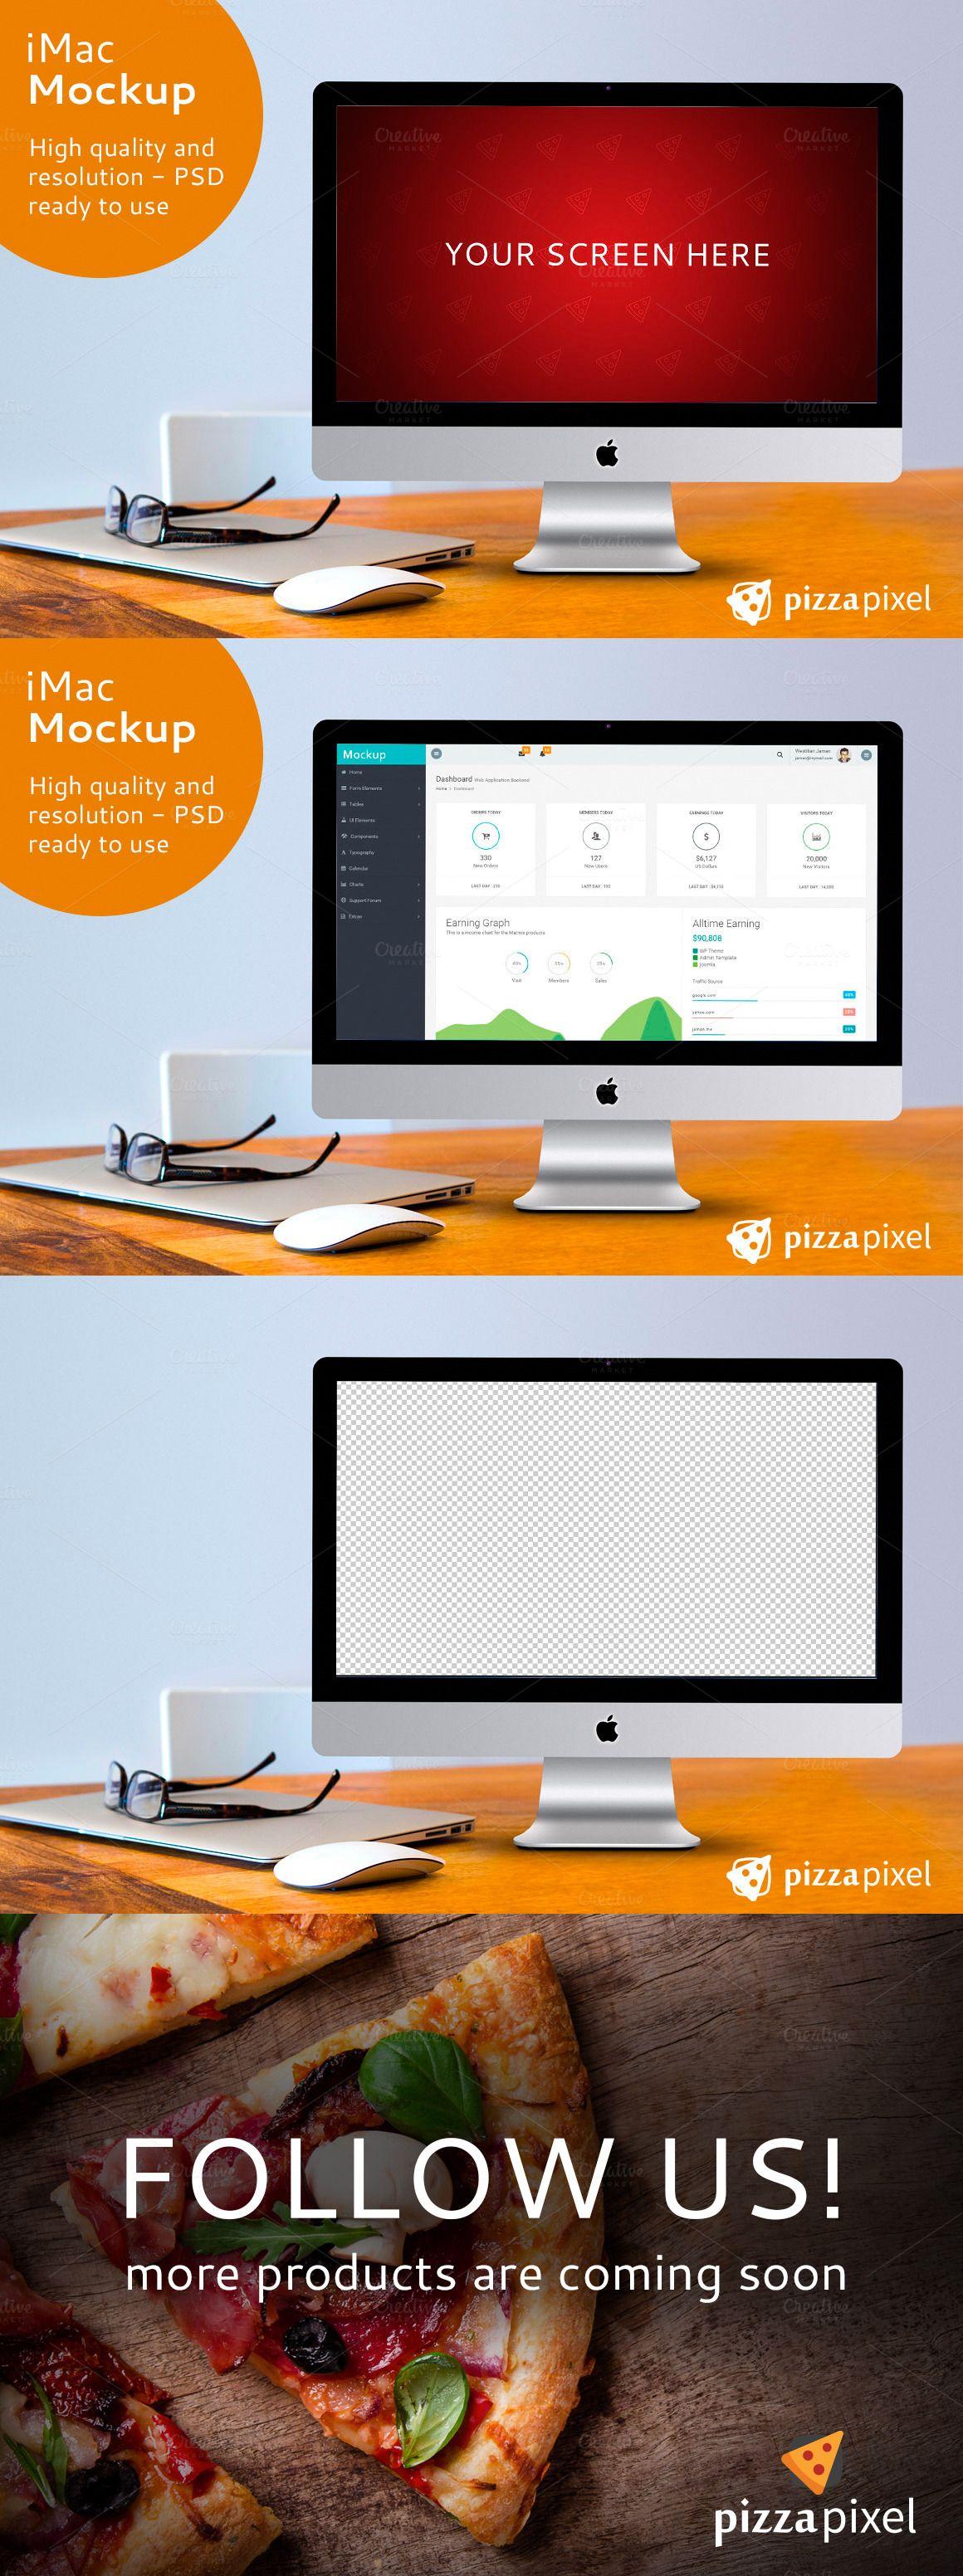 iMac Screen Mockup PSD File | Pinterest